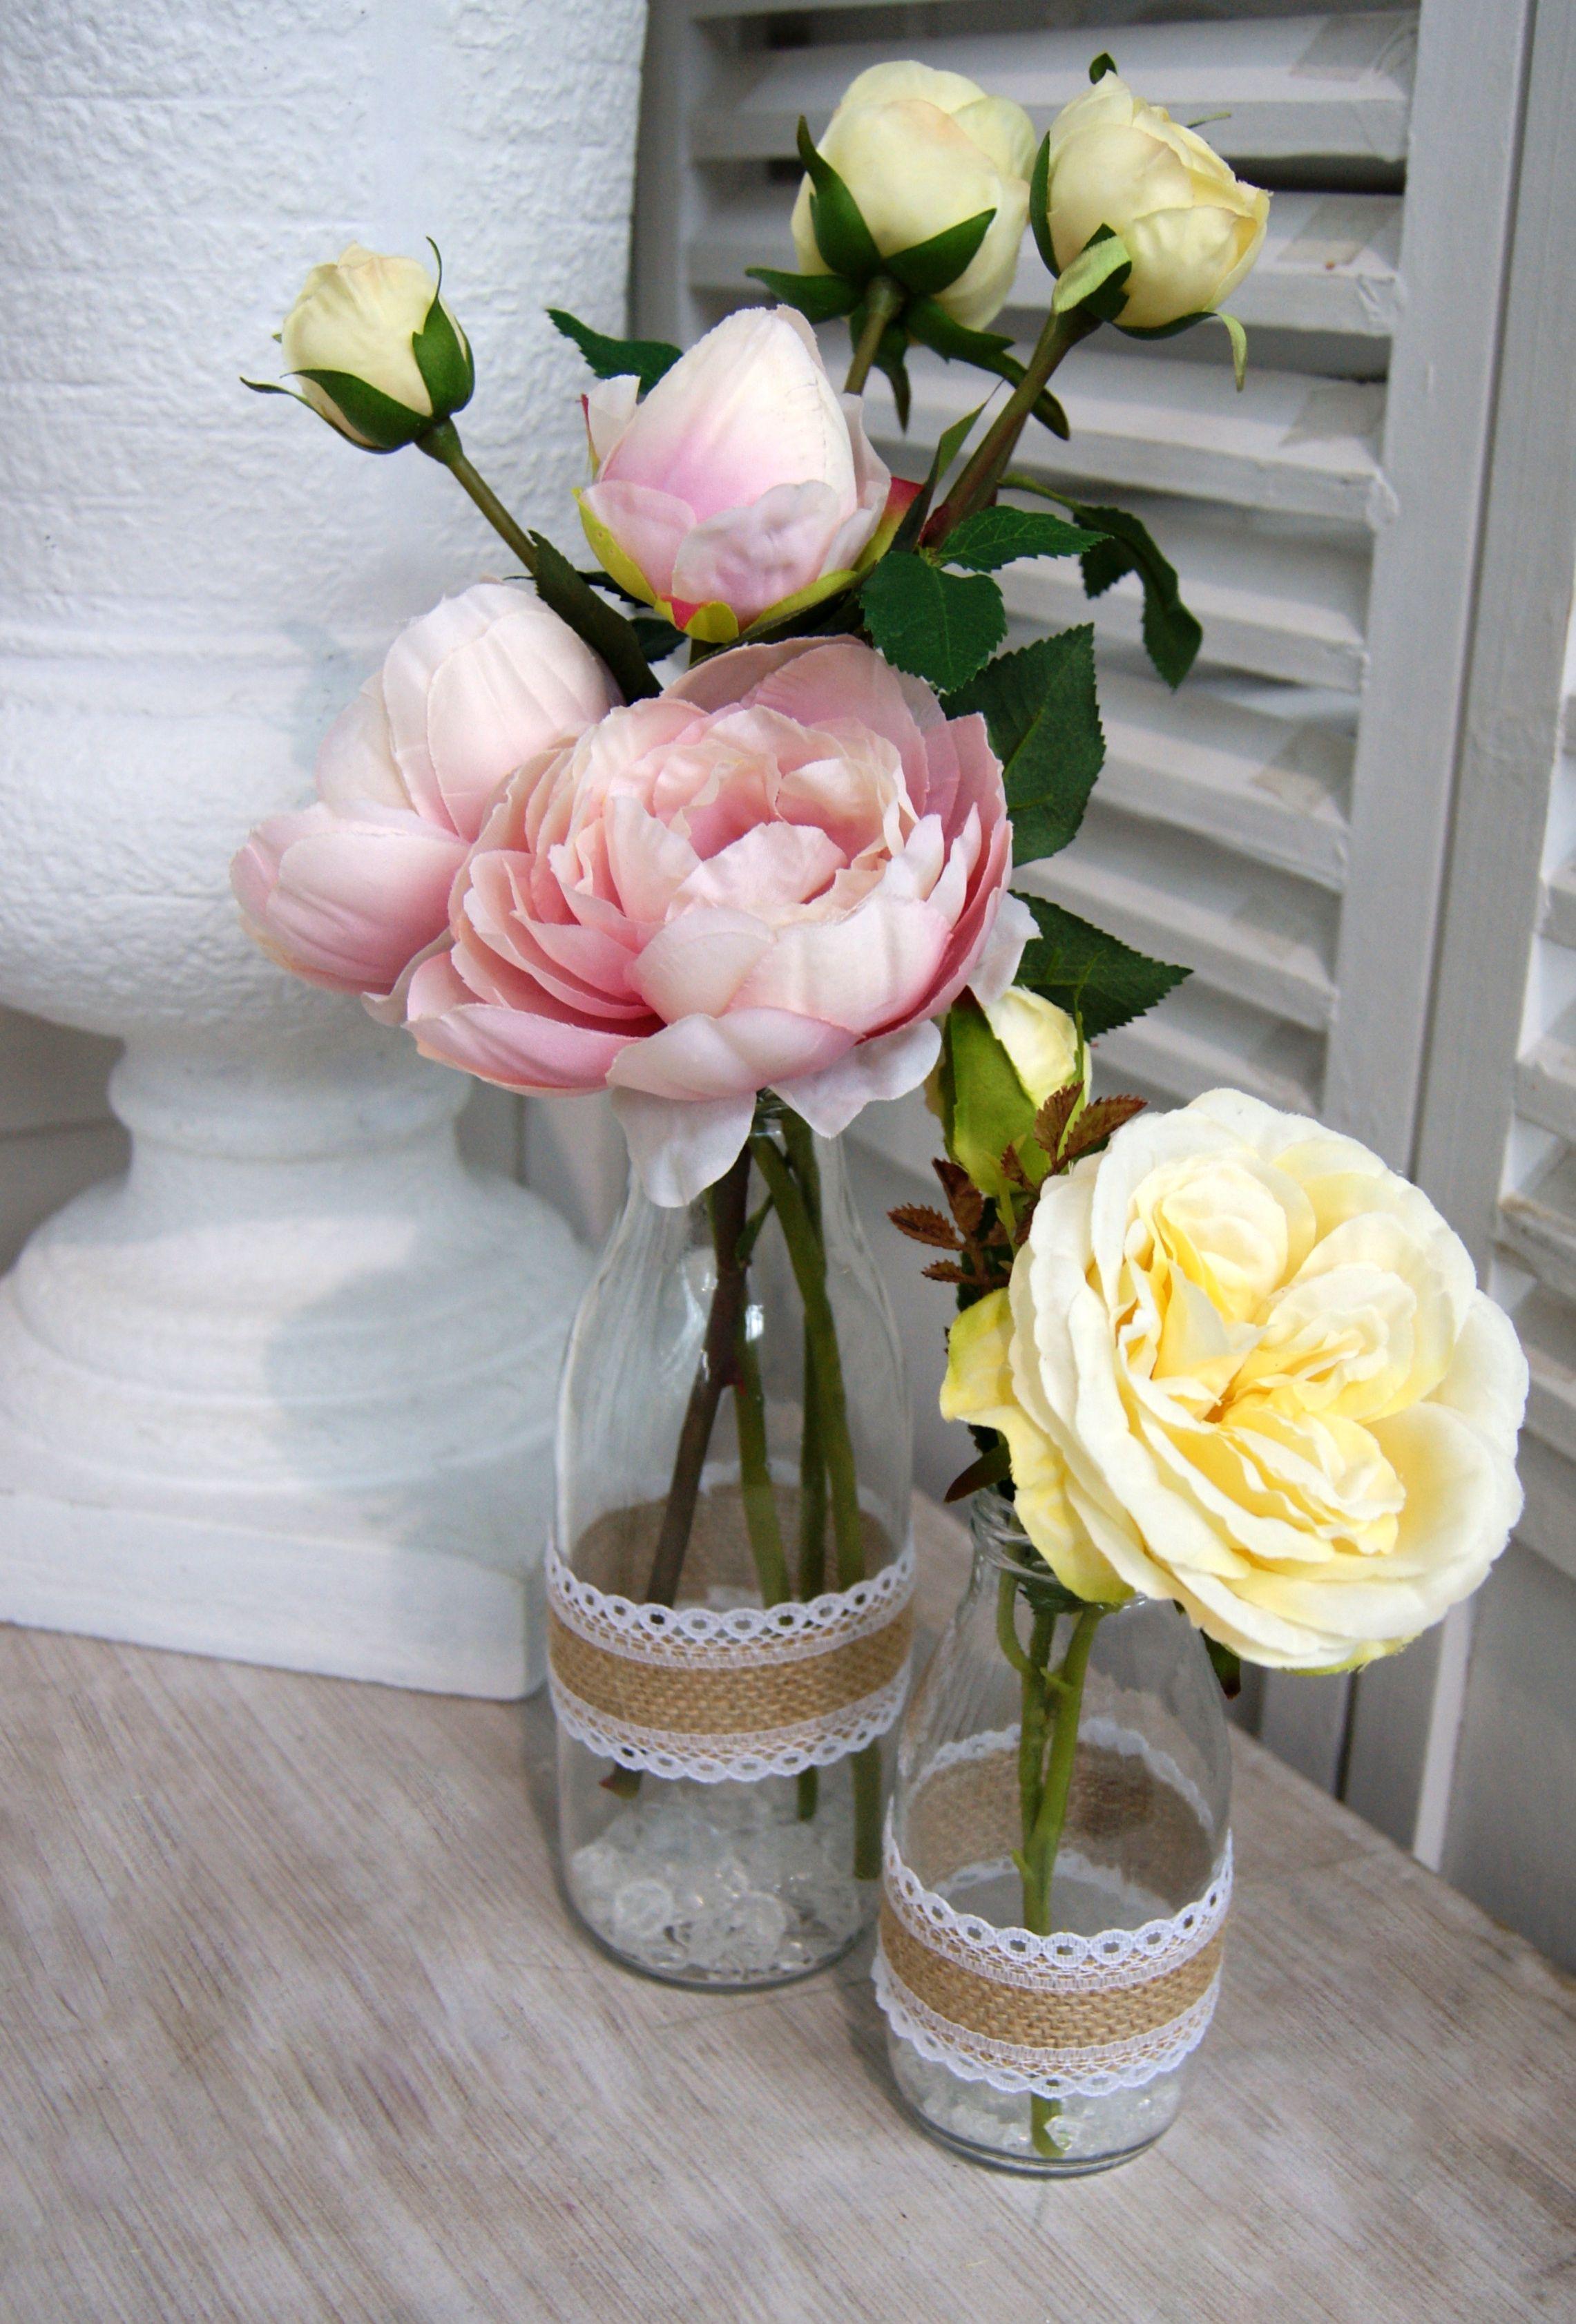 Wedding table decorations small milk bottles with pink and lemon wedding table decorations small milk bottles with pink and lemon roses artificial flowers junglespirit Gallery